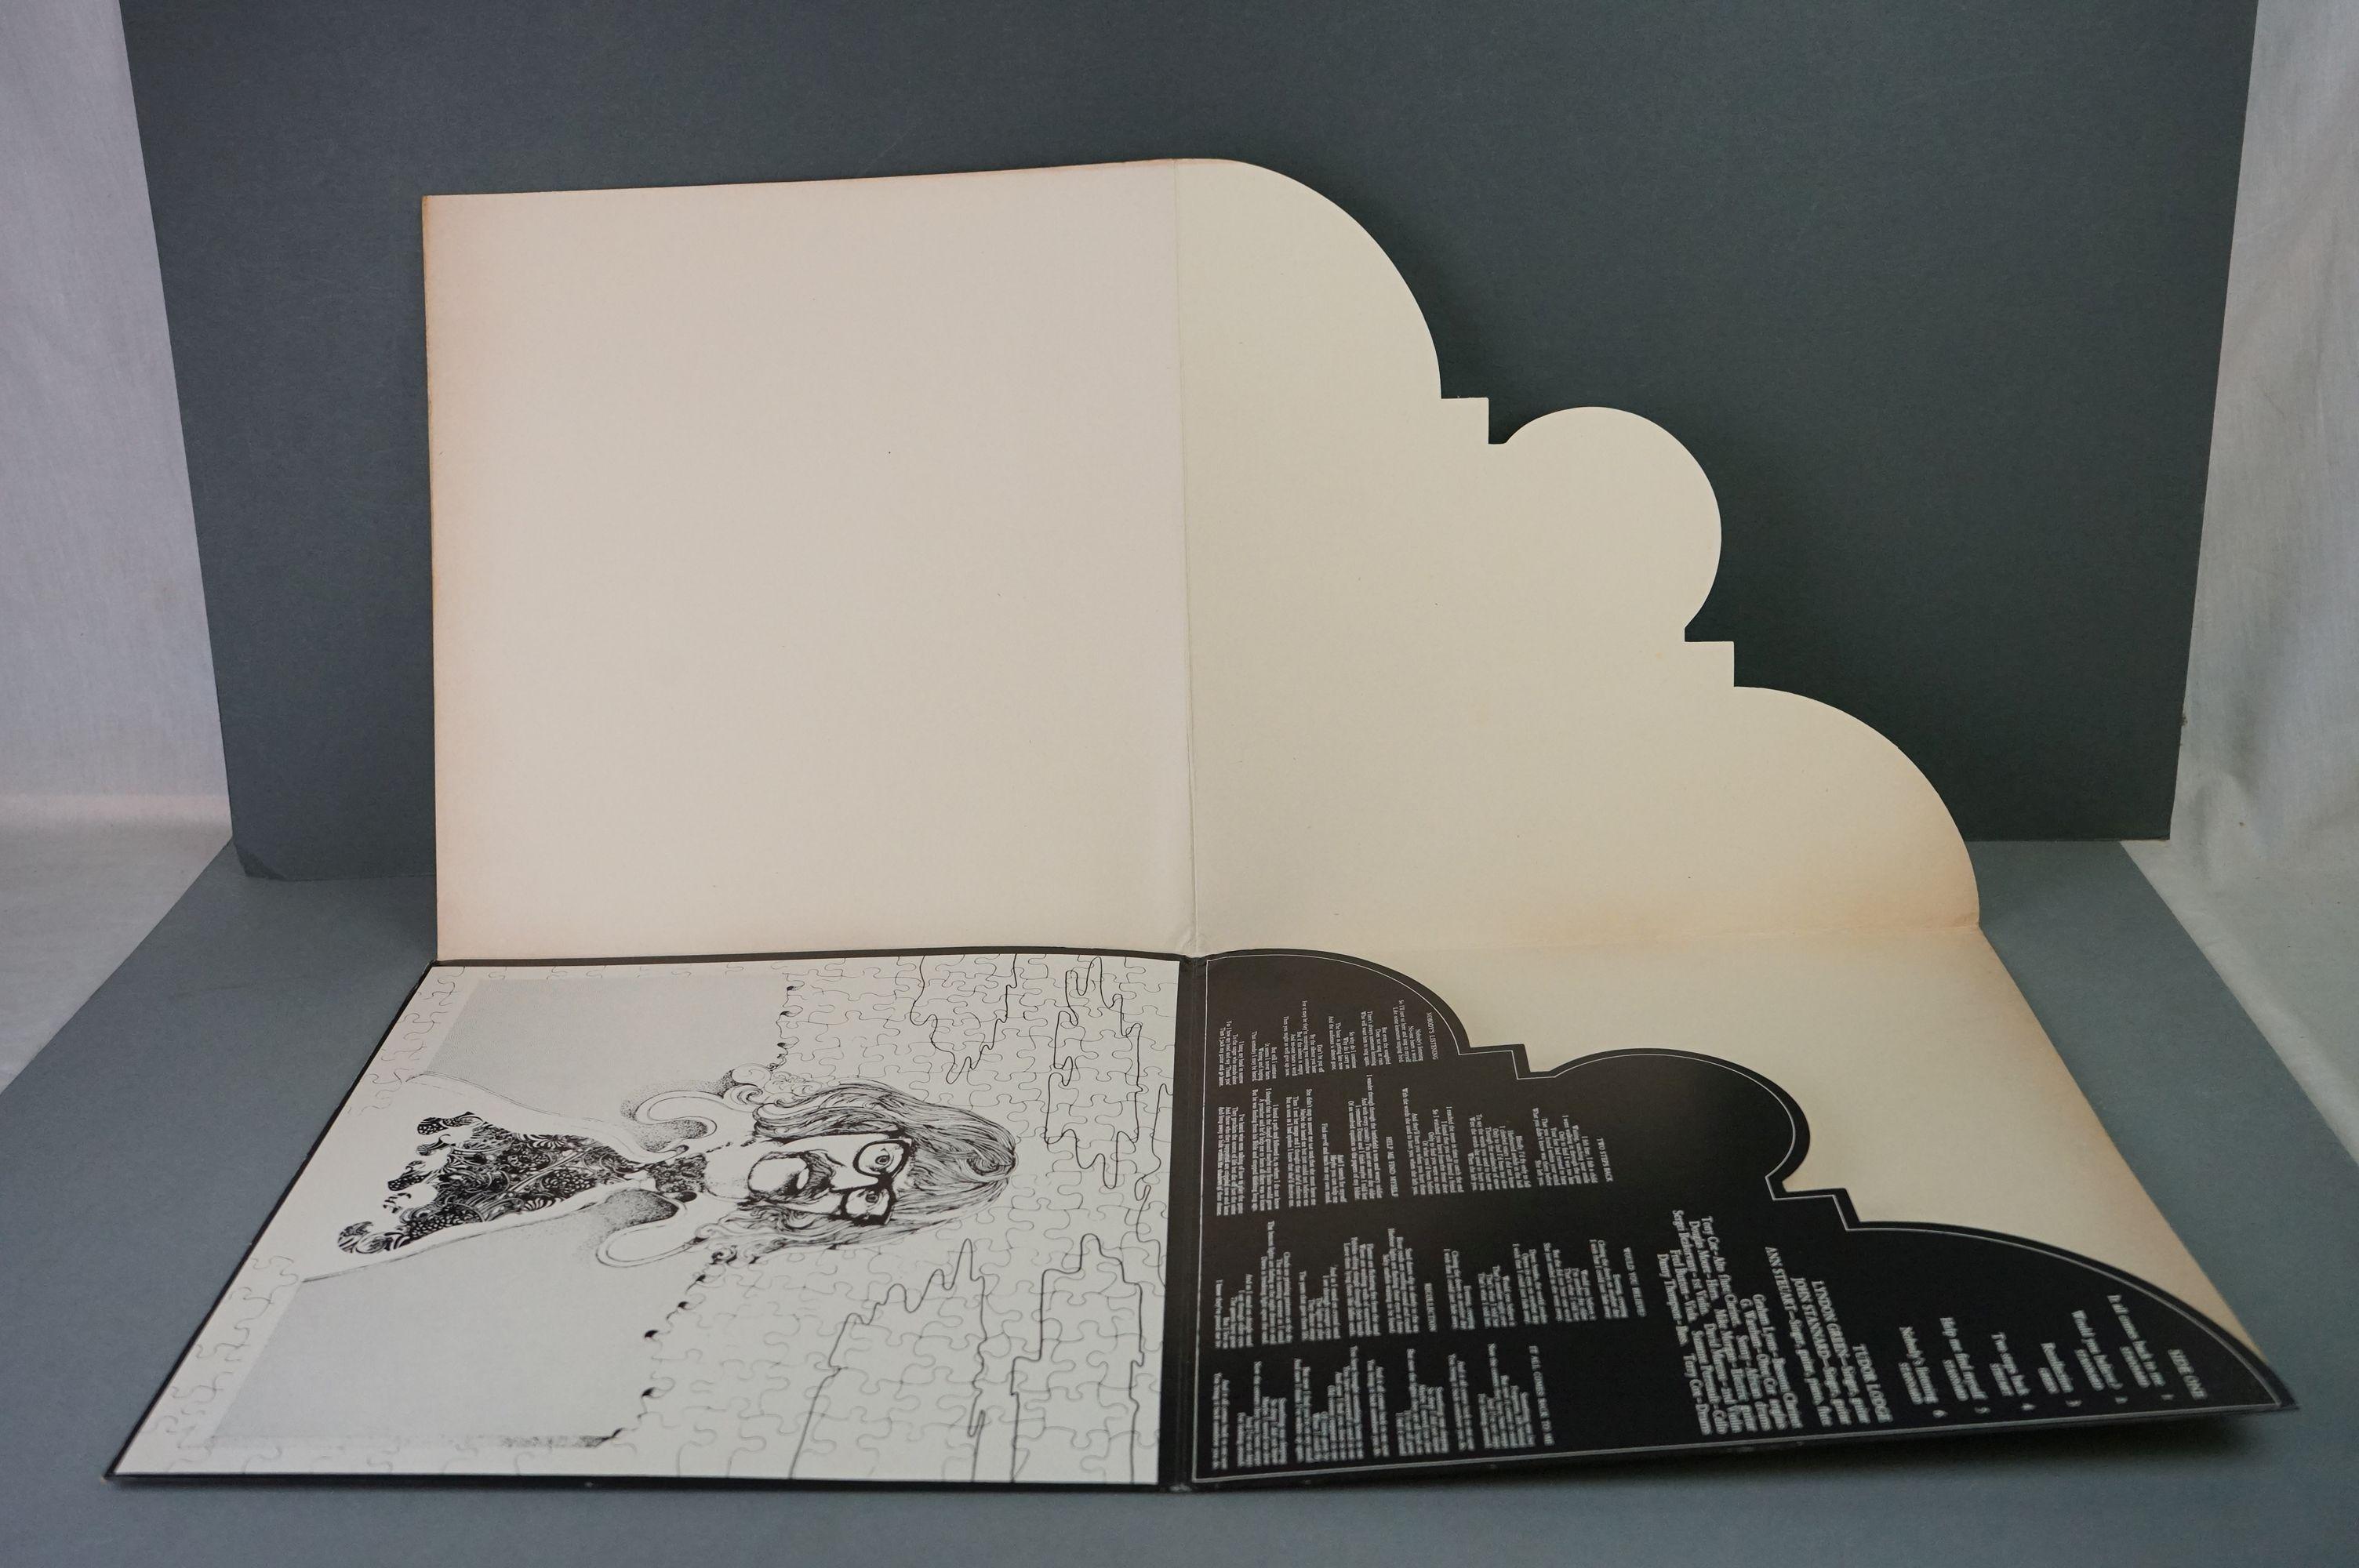 Vinyl - Tudor Lodge self titled LP on Vertigo 6360043 Unofficial release, not play tested - Image 3 of 7